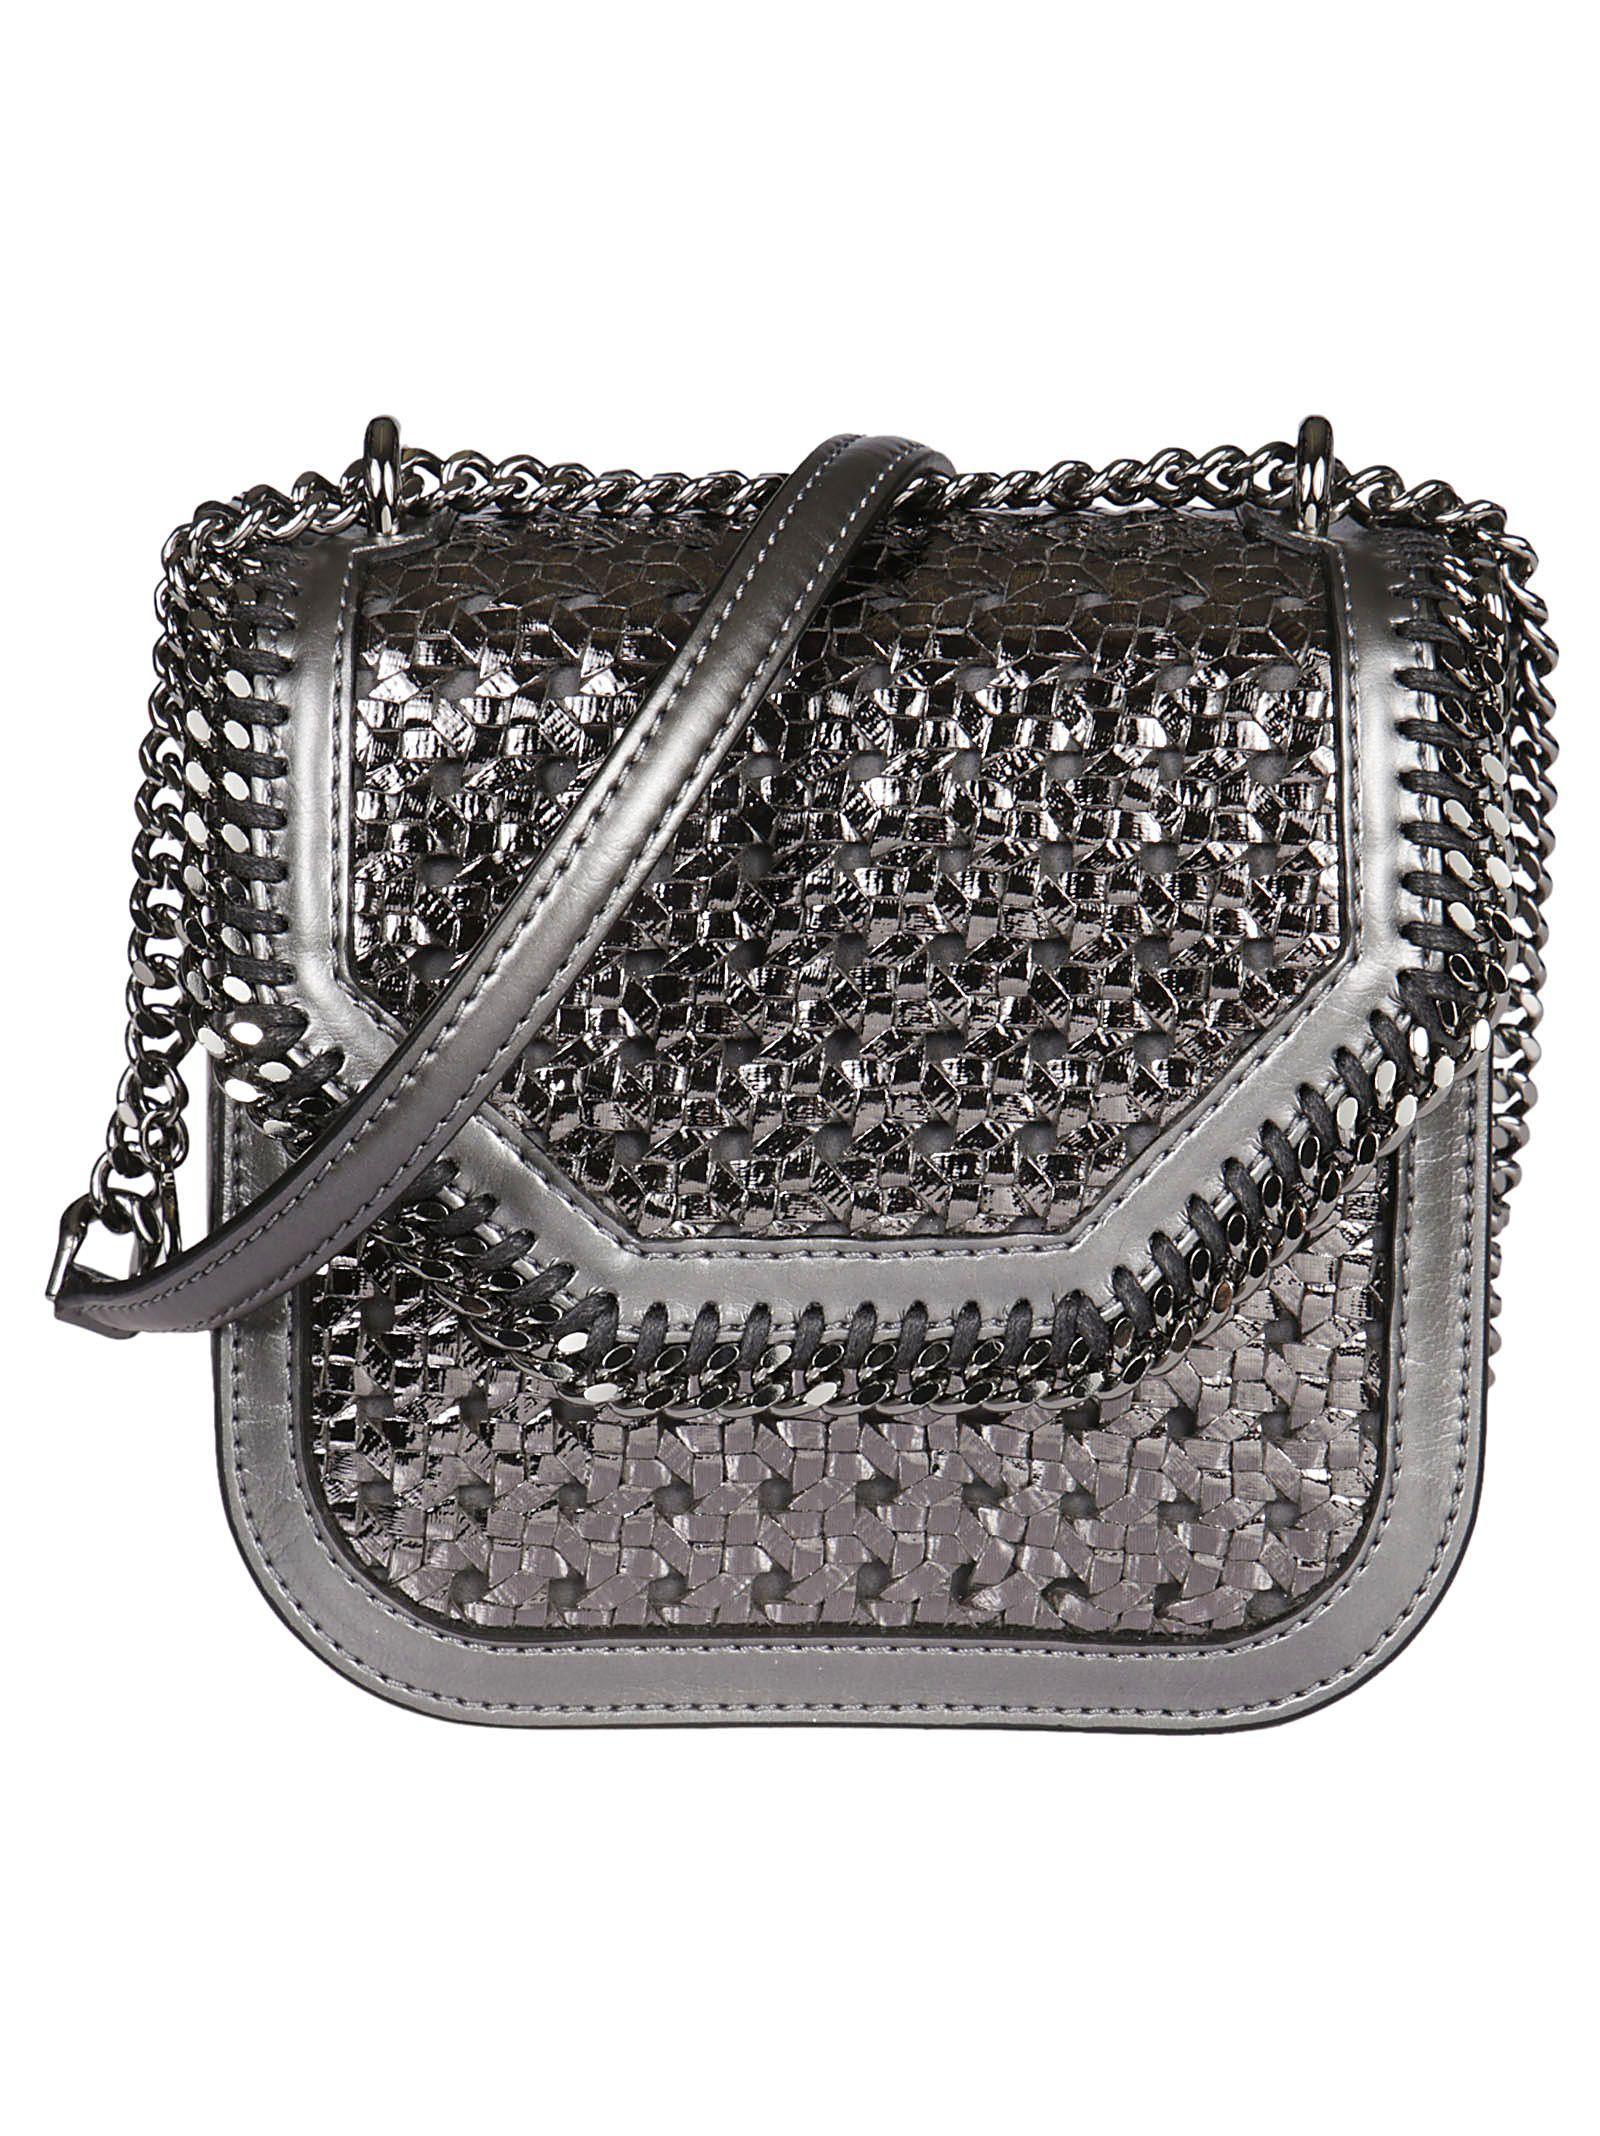 Stella Mccartney Wicker Falabella Box Shoulder Bag In Silver